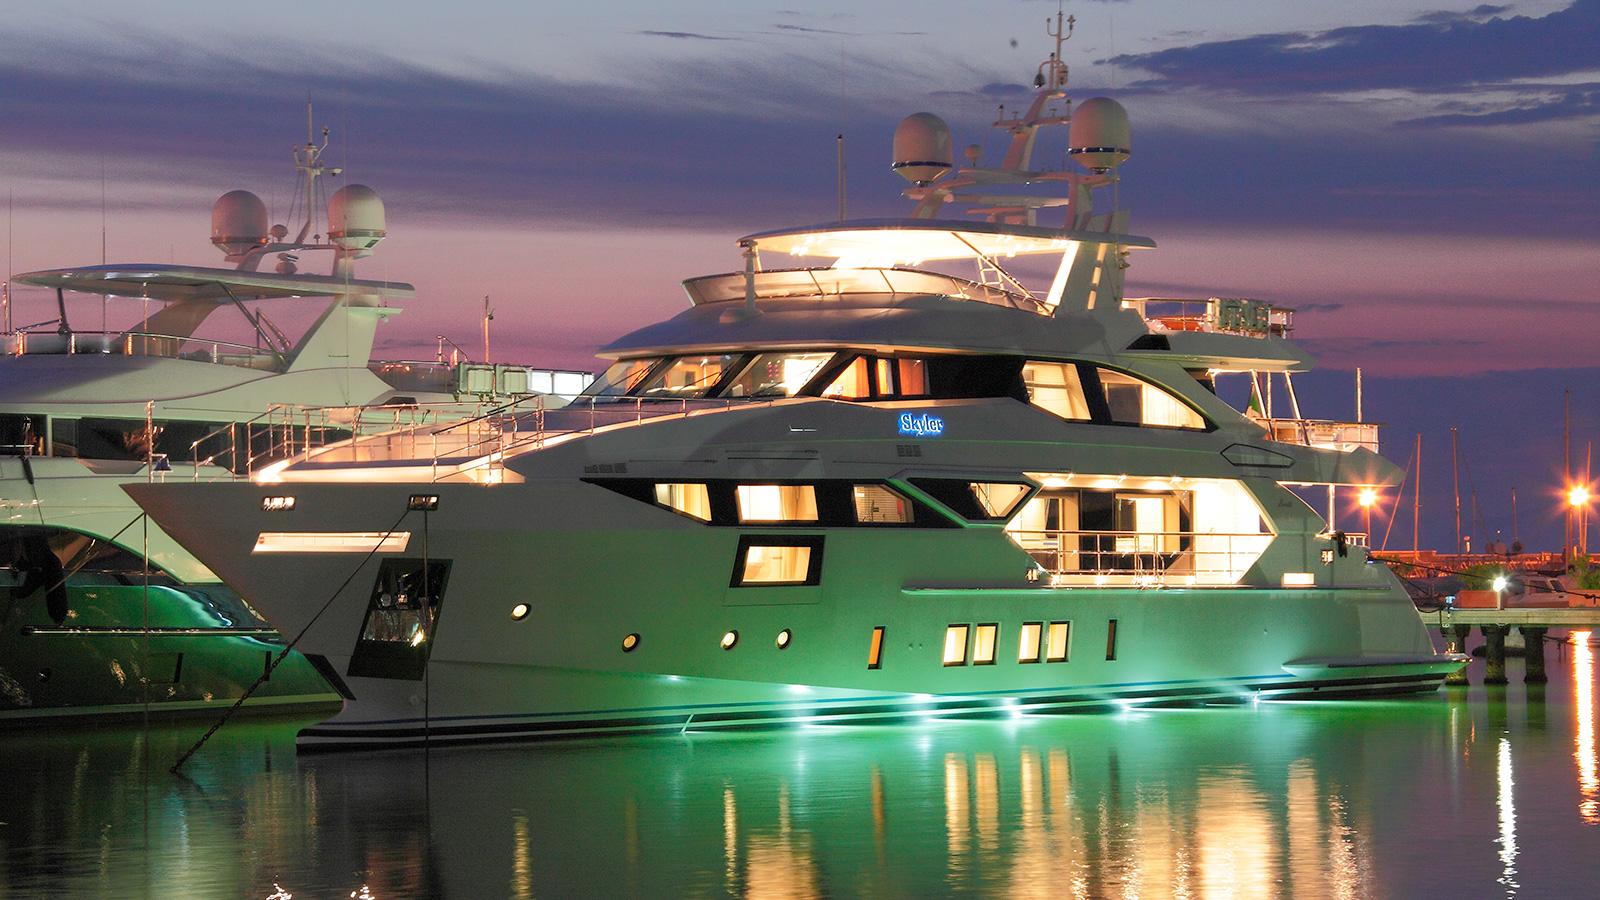 the-benetti-fast-125-yacht-skyler-at-night